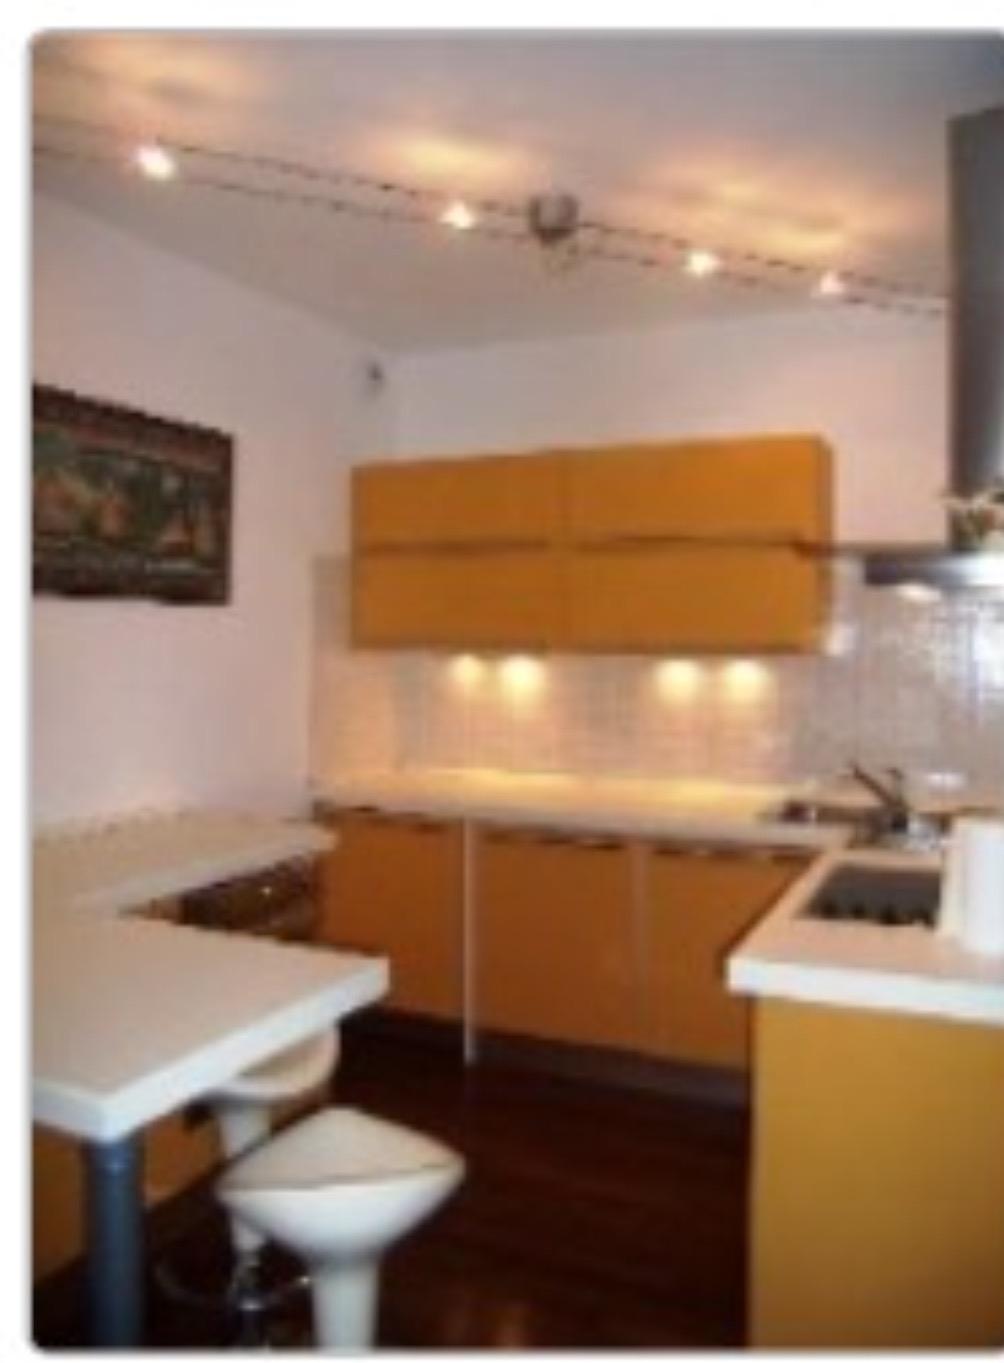 Vimodrone | Appartamento in Vendita in Viale Martesana | lacasadimilano.it